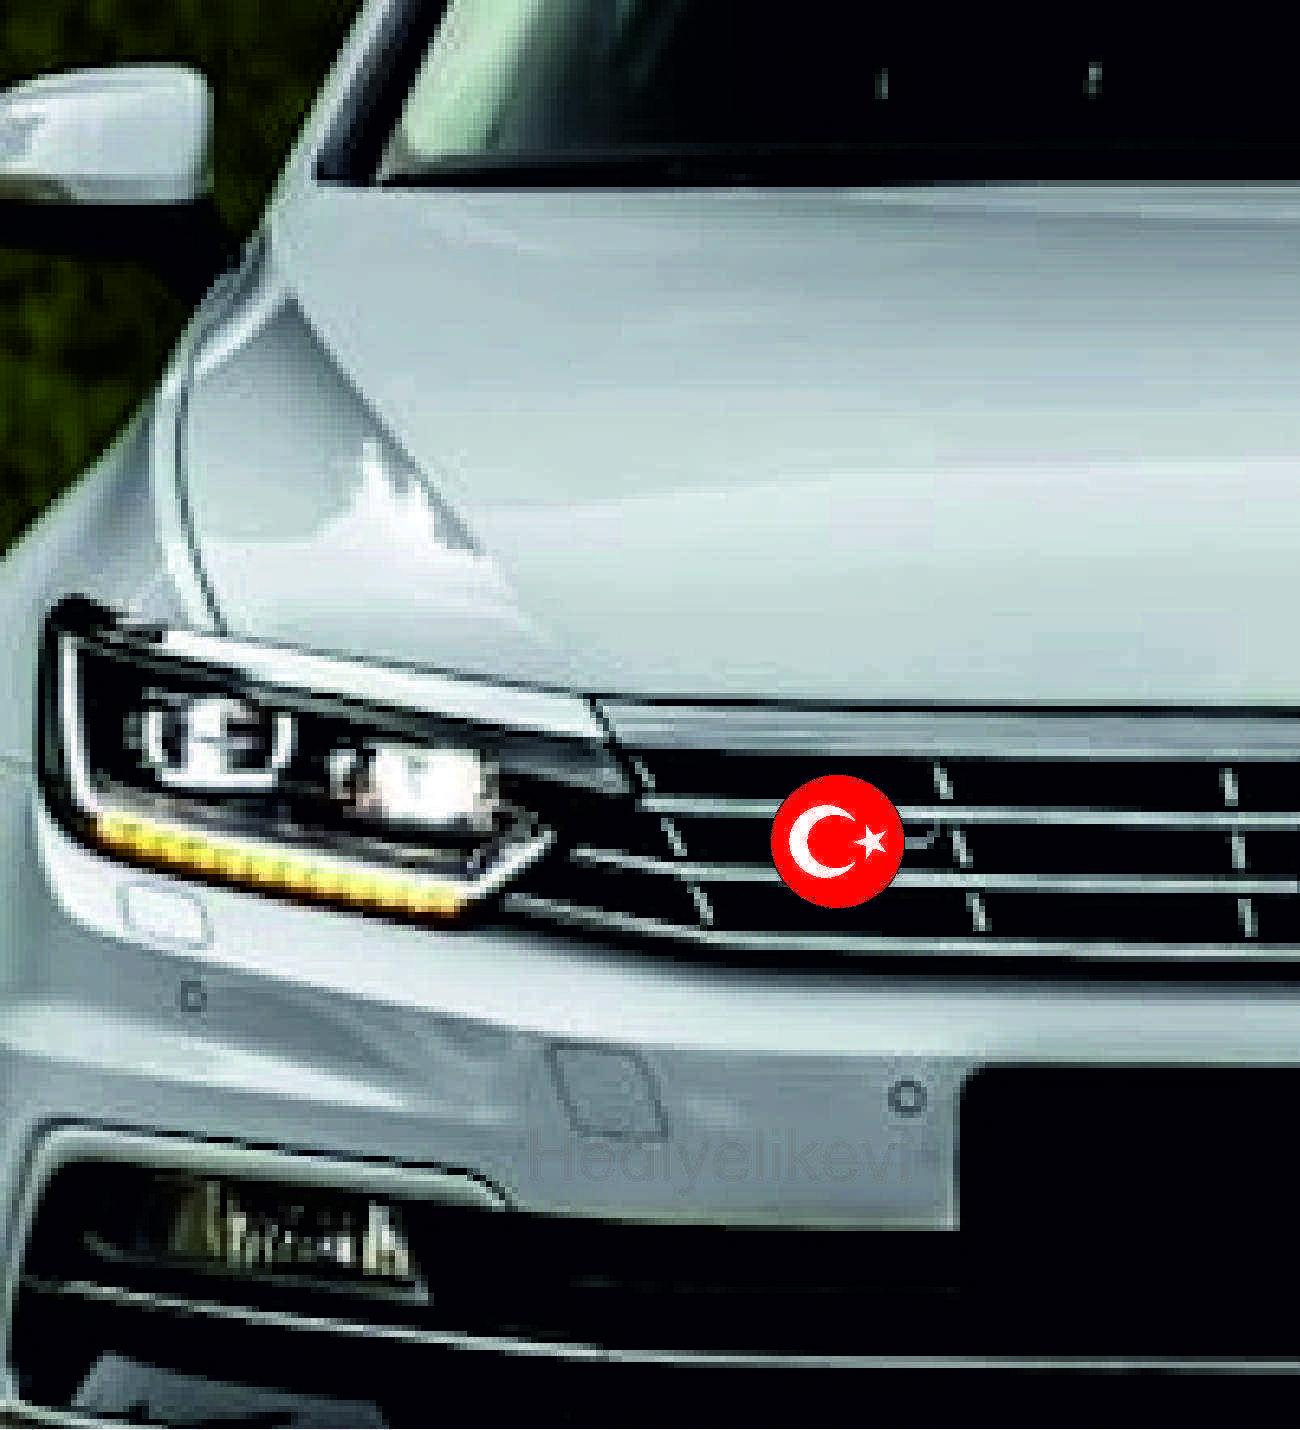 Araç Ön Panjur Logosu Panjur Arma TR Oval Bayrak  logolu